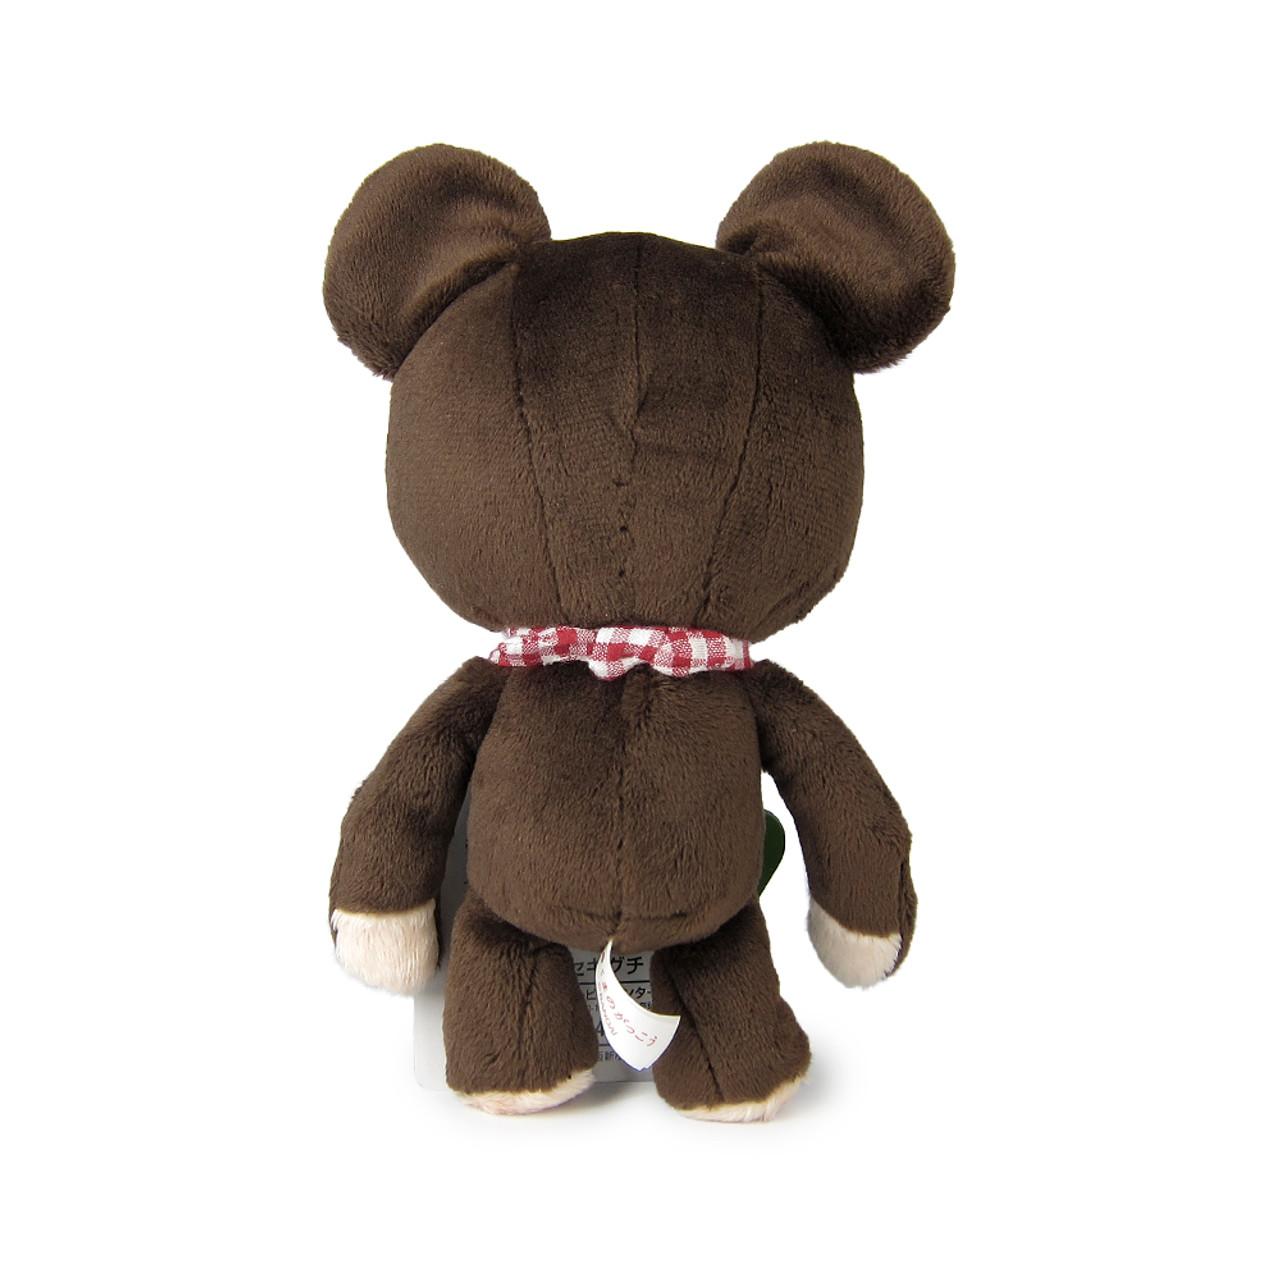 Sekiguchi The Bears School Jackie Red Checker Scarf Soft Plush Doll ( Back View )